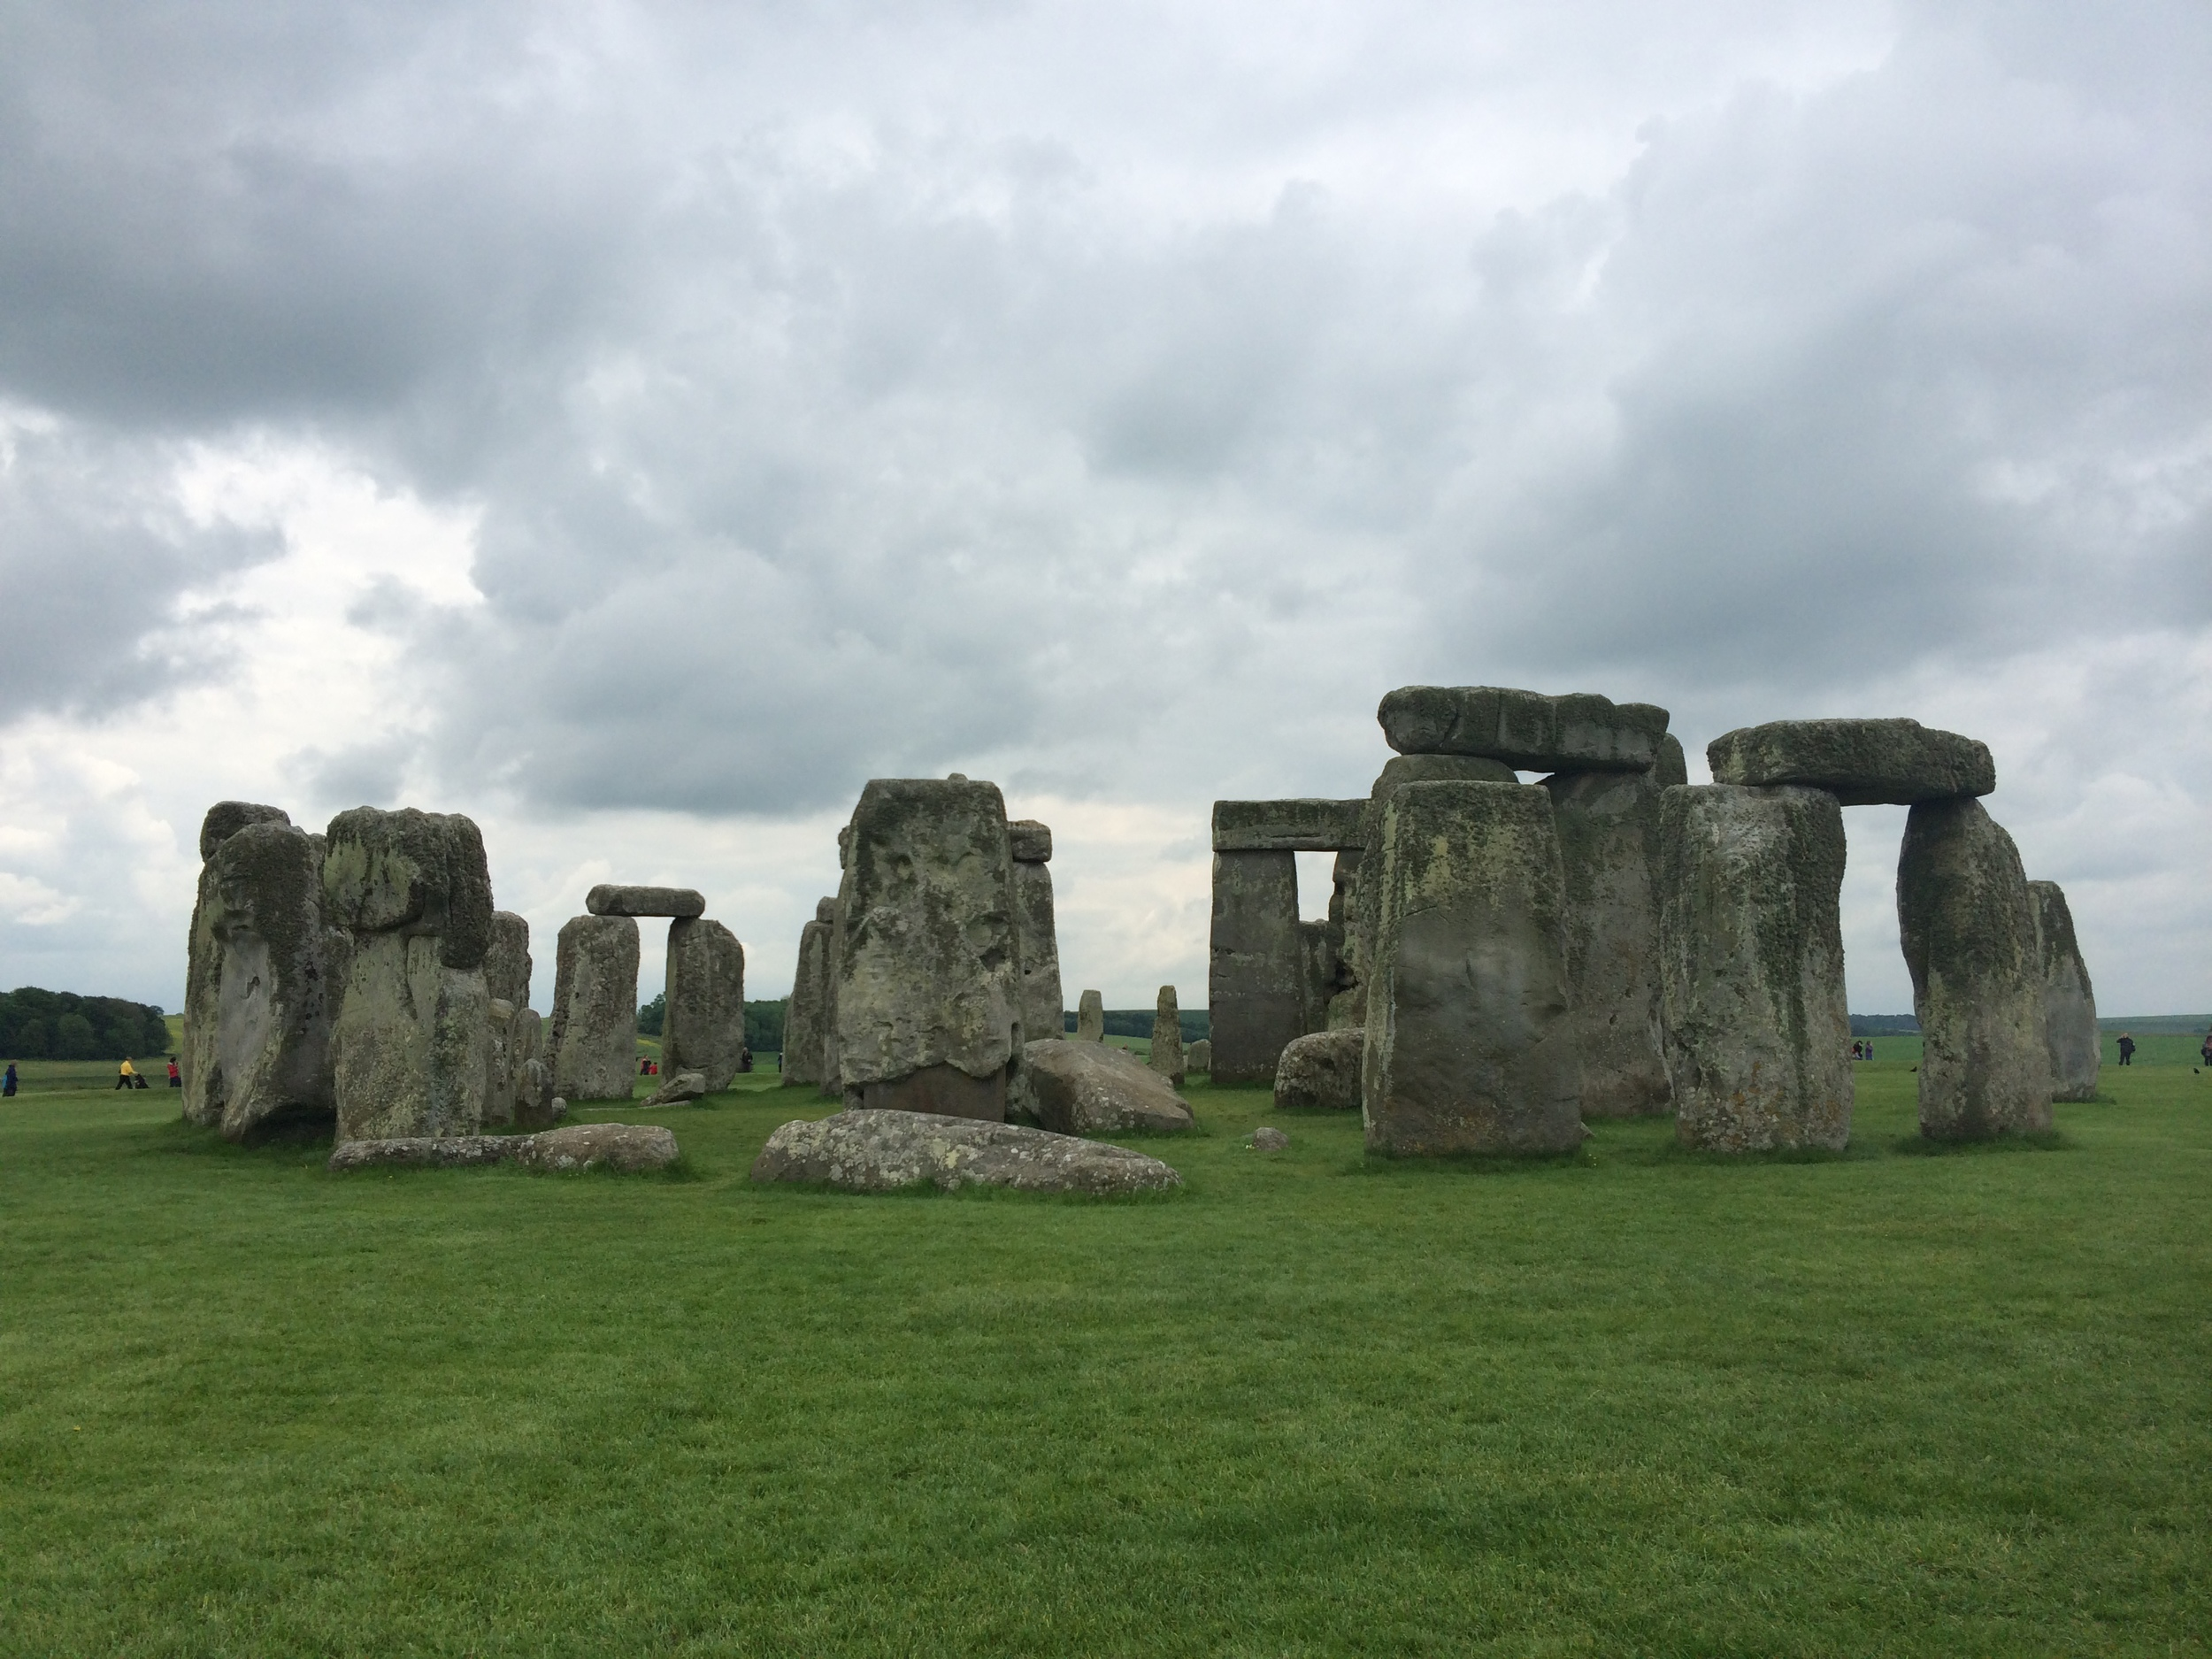 Stonehenge--breath taking!